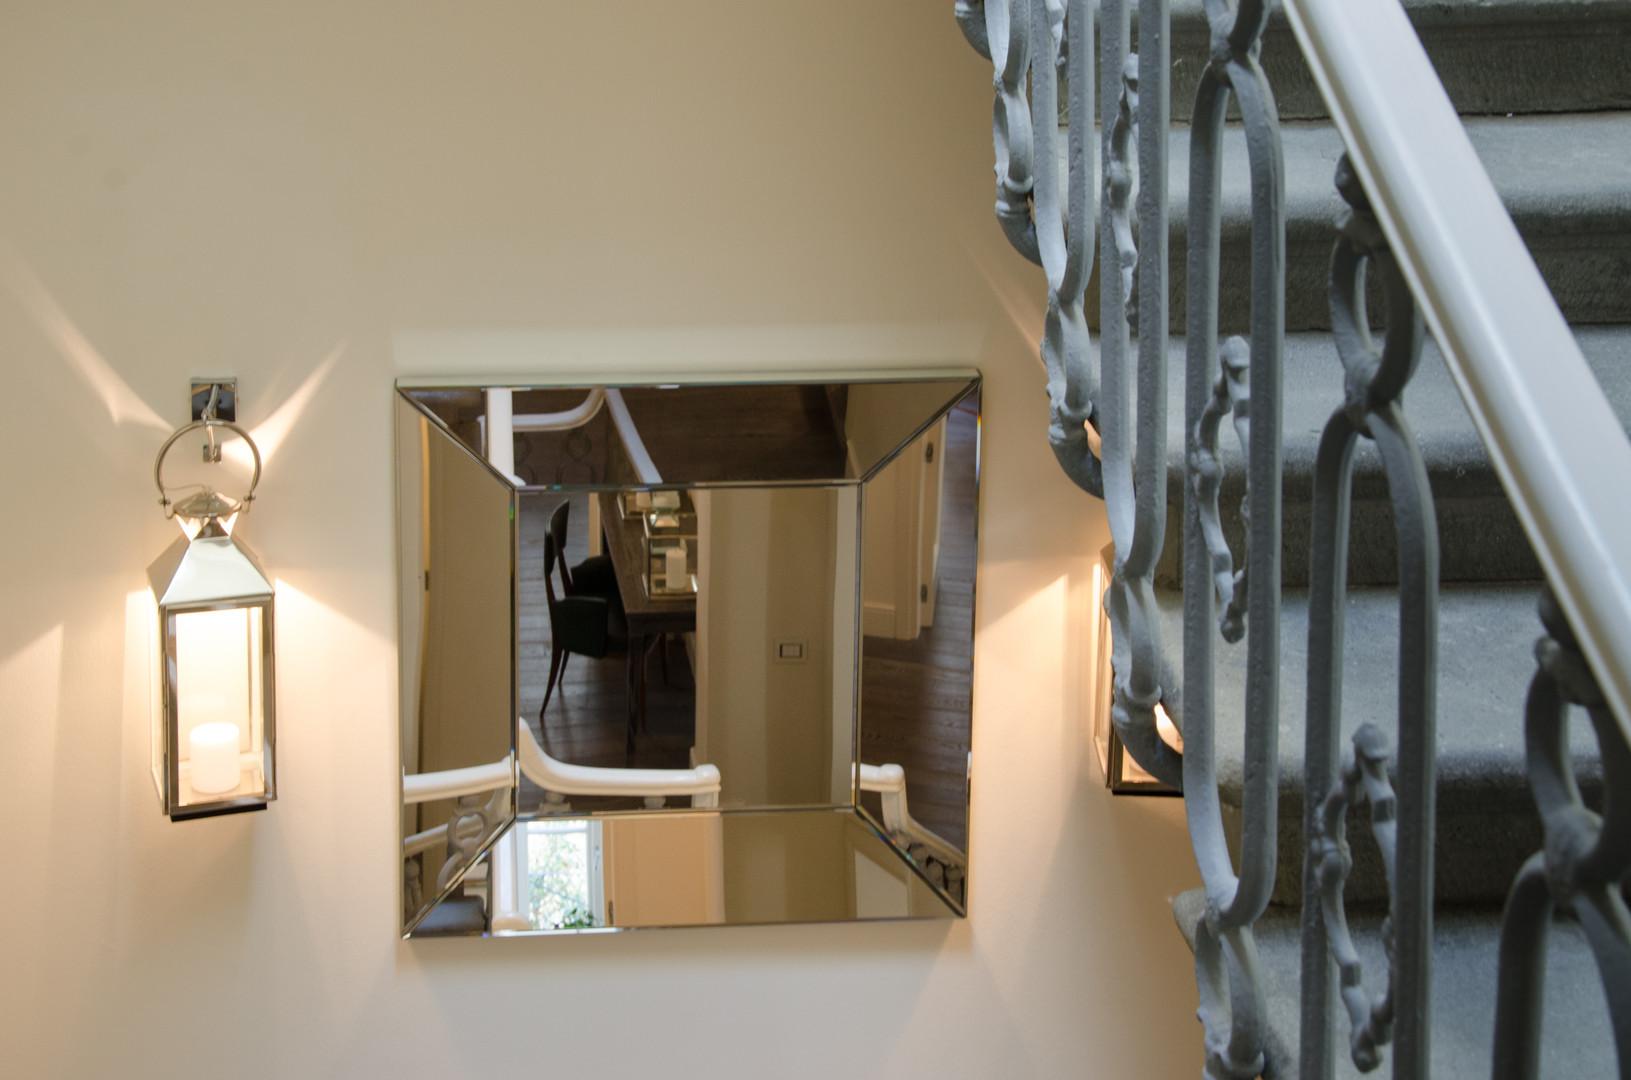 13 B&B Hall- Susanne Paetsch interior photo